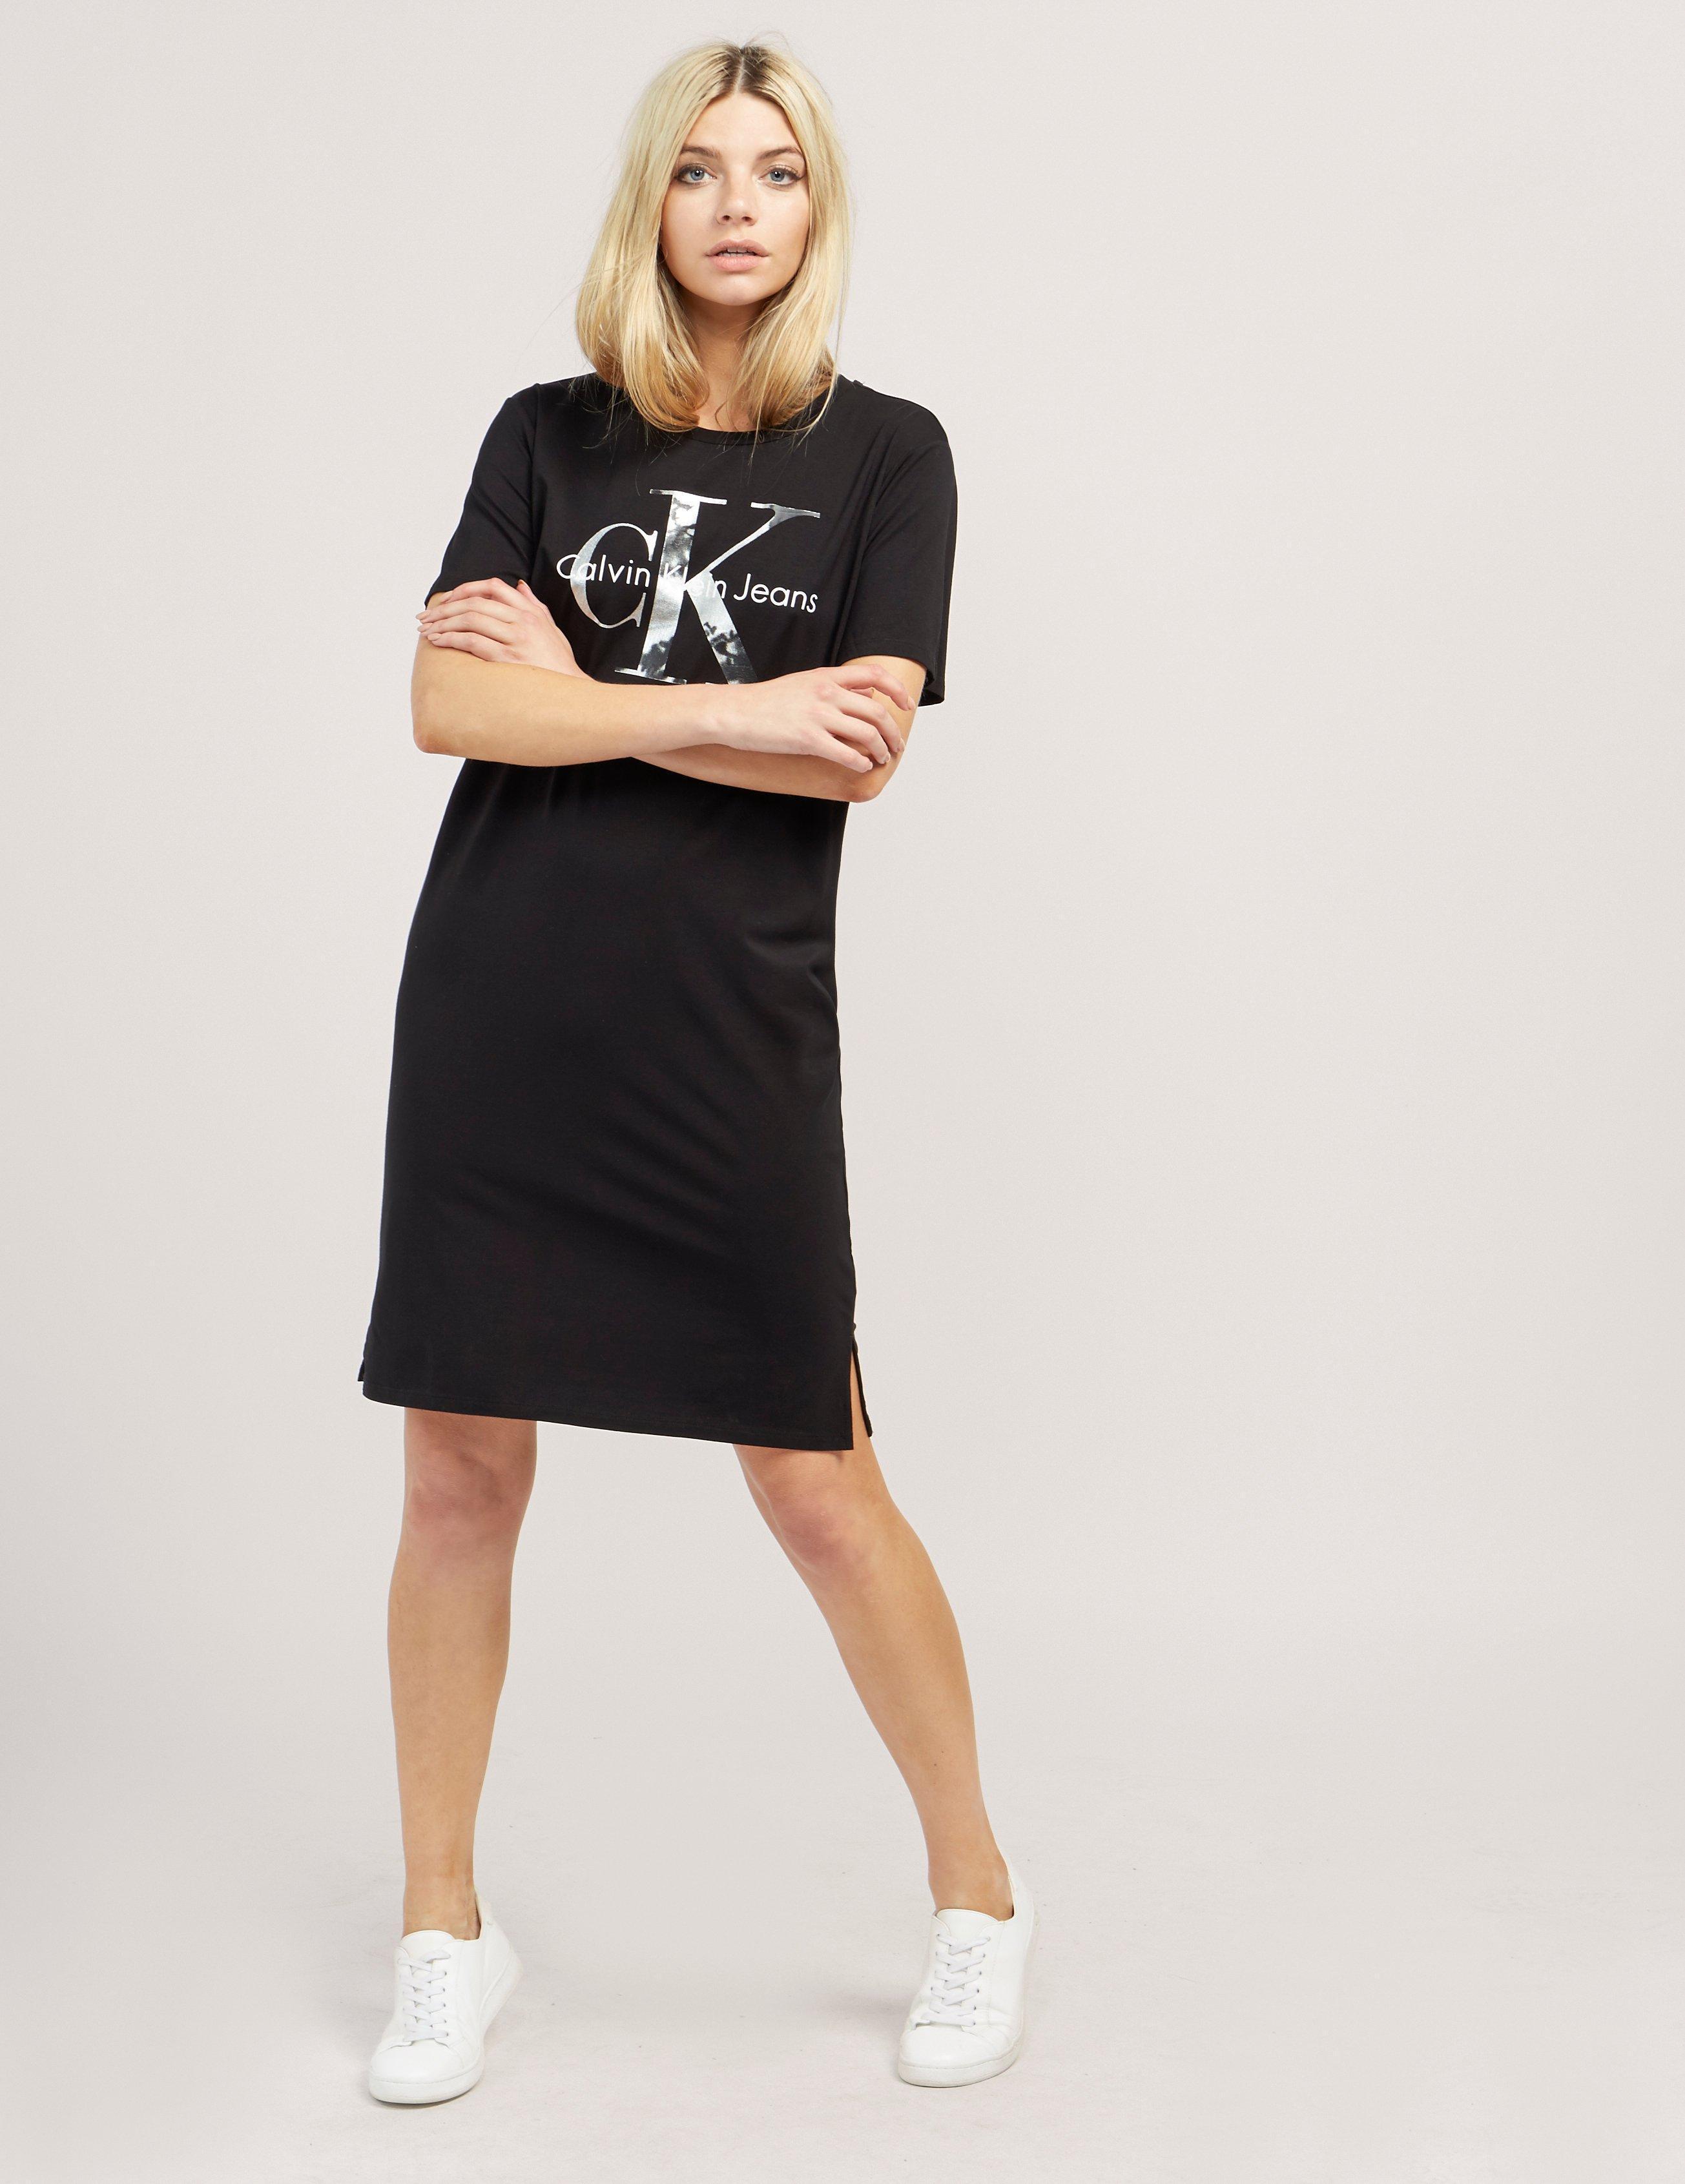 b2f28f41cc ... Lyst Calvin Klein Dakota Icon T shirt Dress in Black